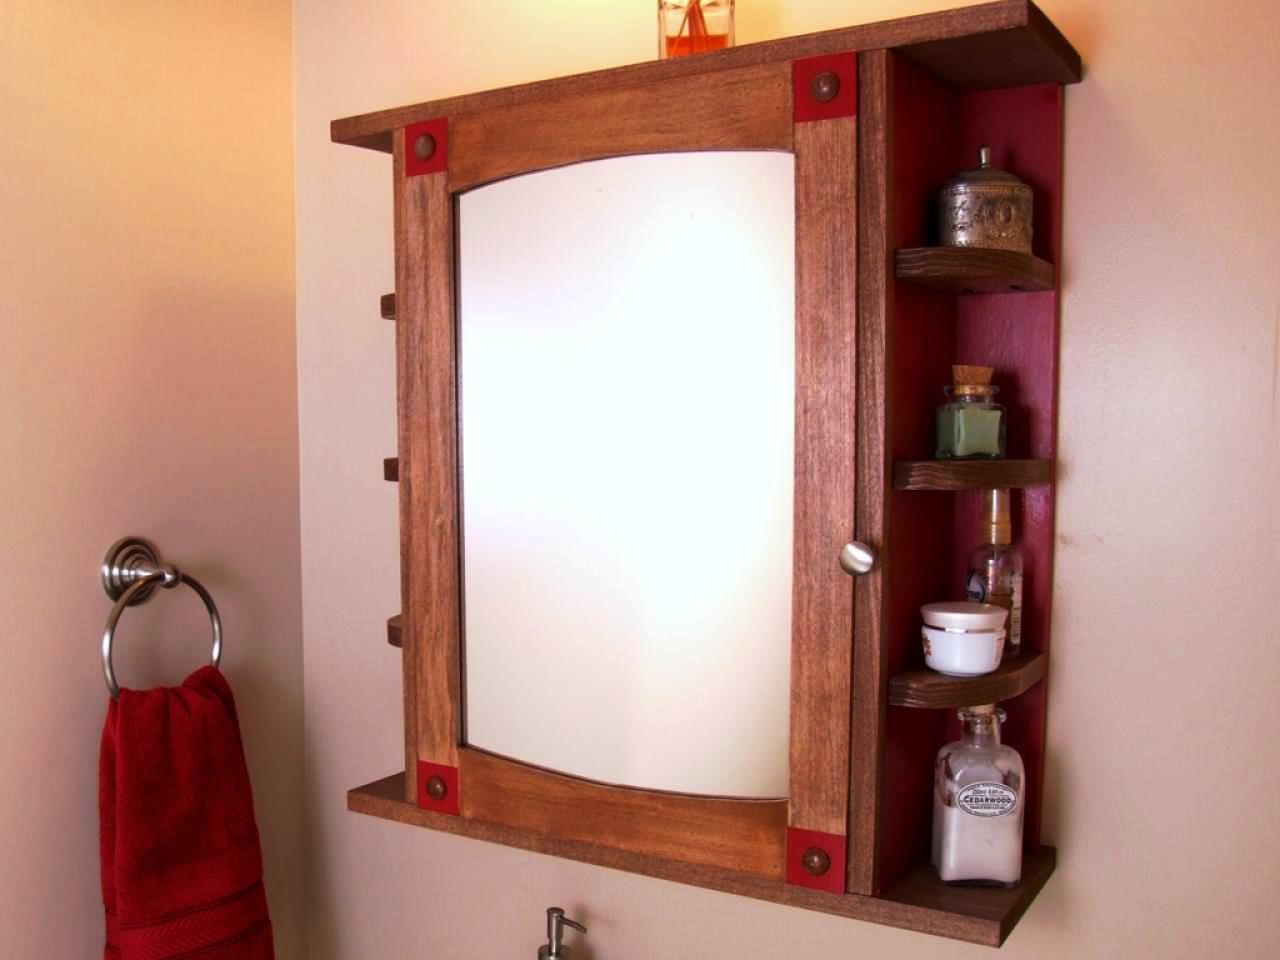 Jensen Medicine Cabinets | Medicine Cabinets Lowes | Bathroom Recessed Medicine Cabinets